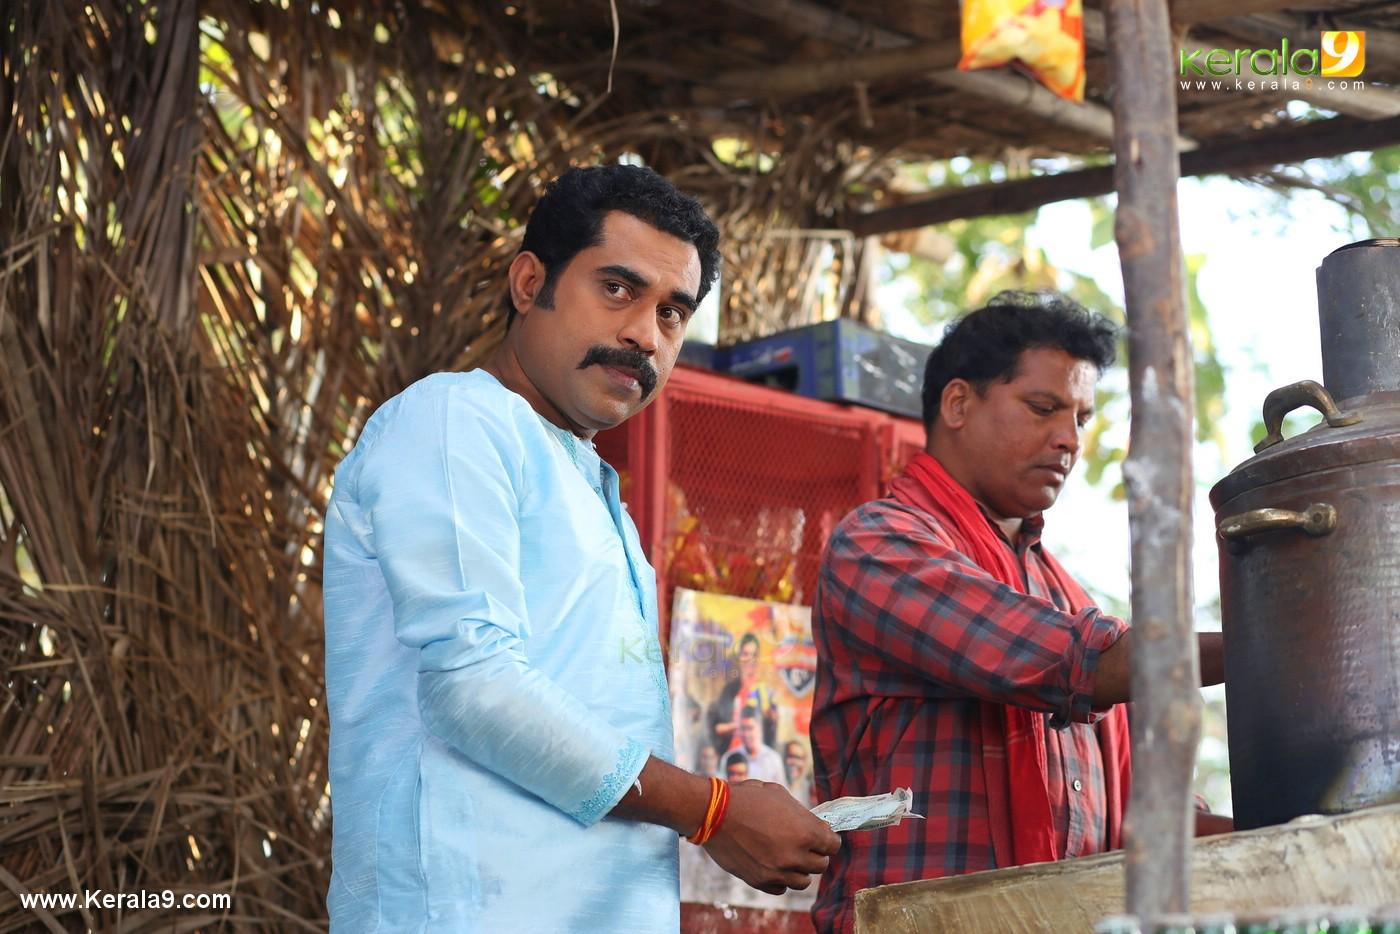 neerali malayalam movie images 0923 34